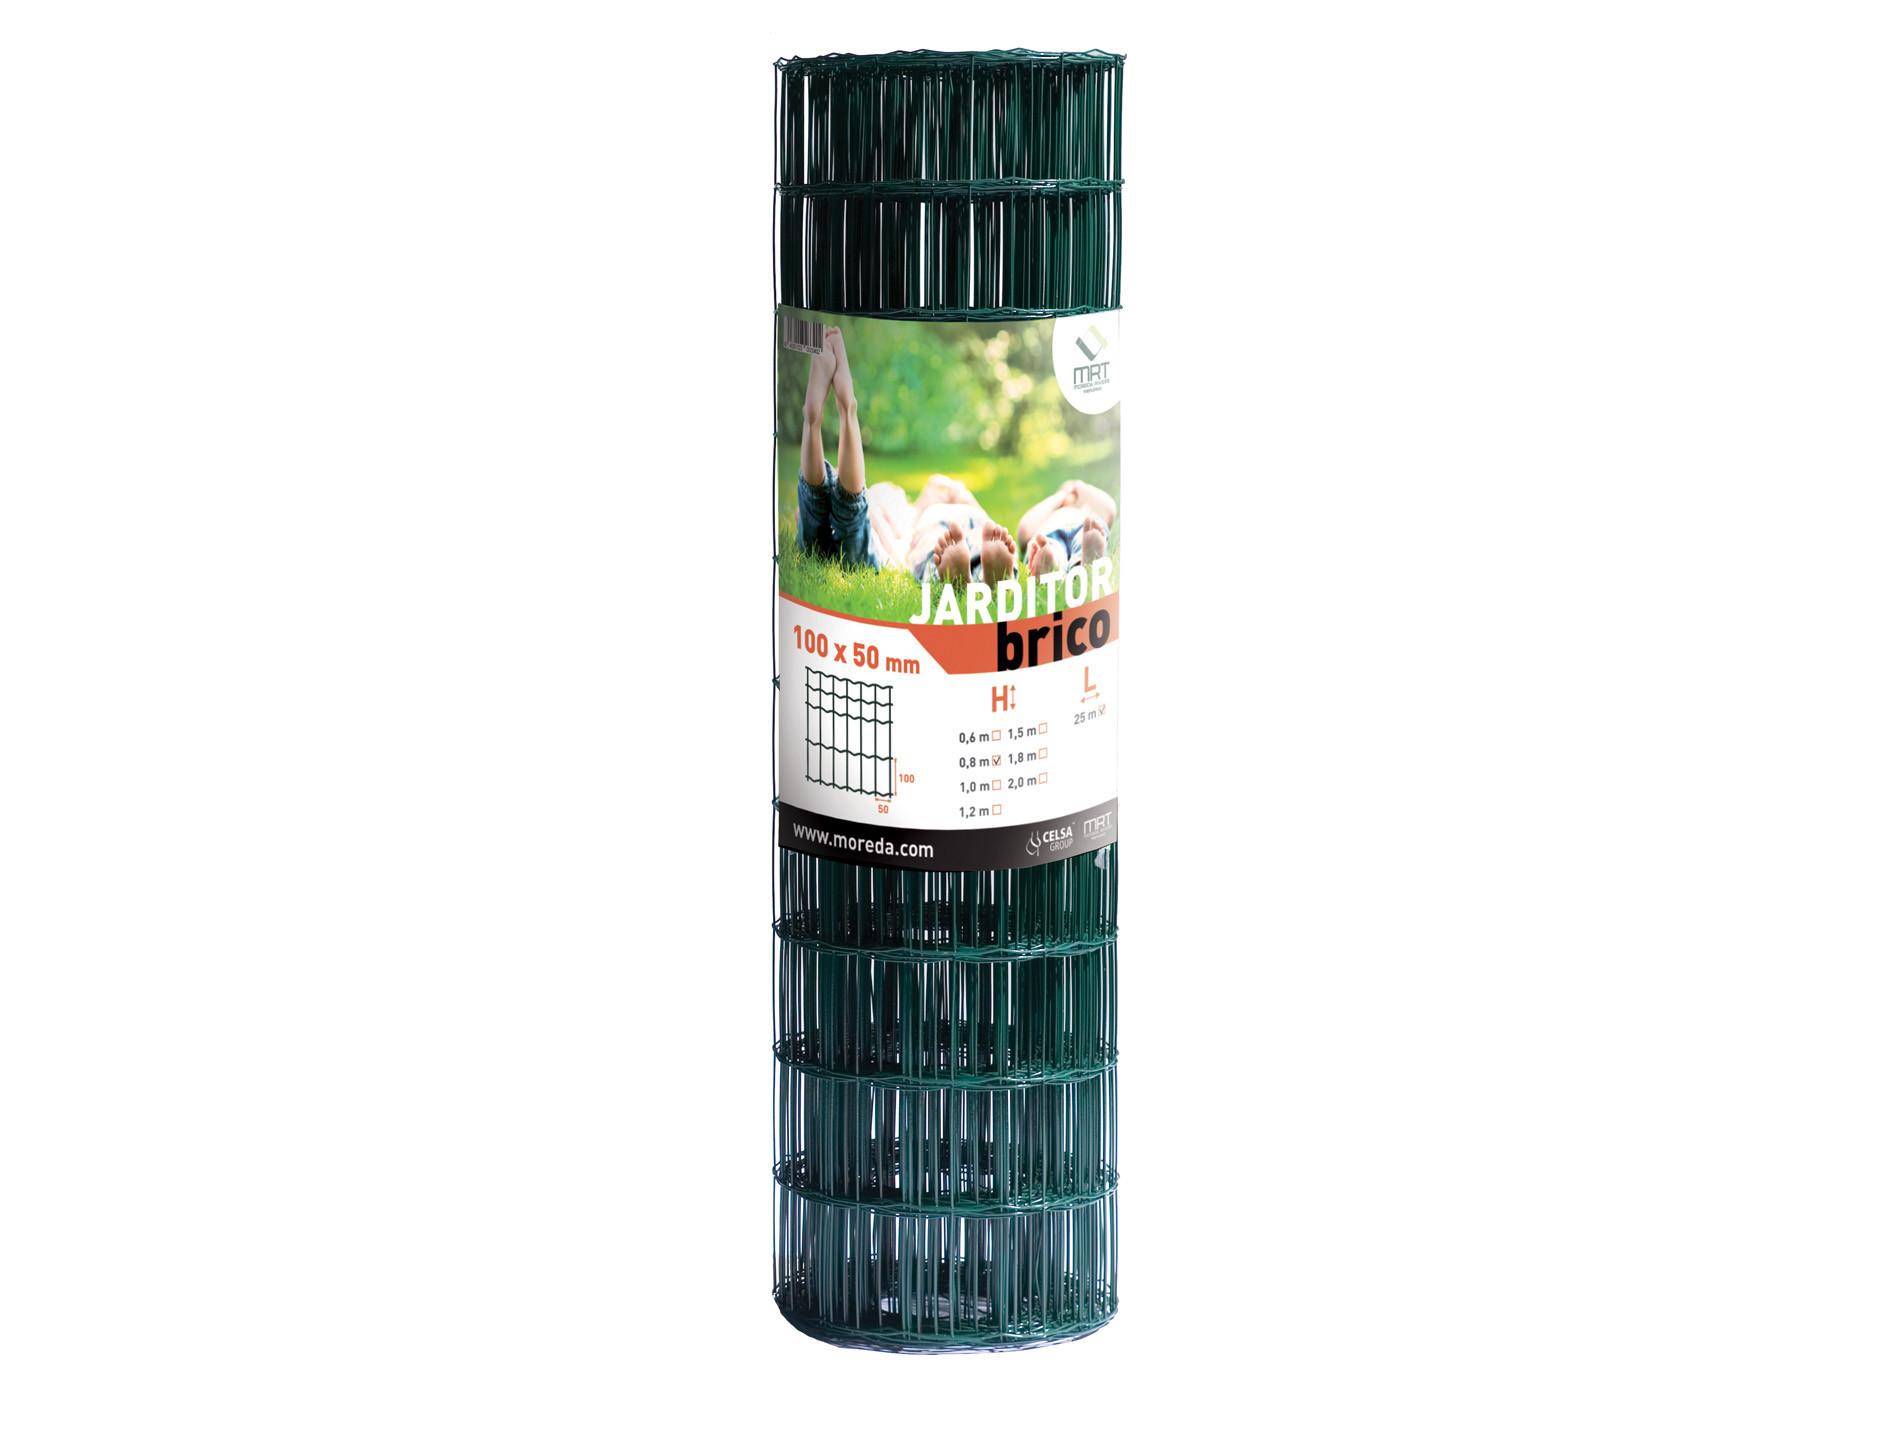 Grillage Jardin Hauteur 2M grillage jardi brico vert 10x5 h2,00m l25m